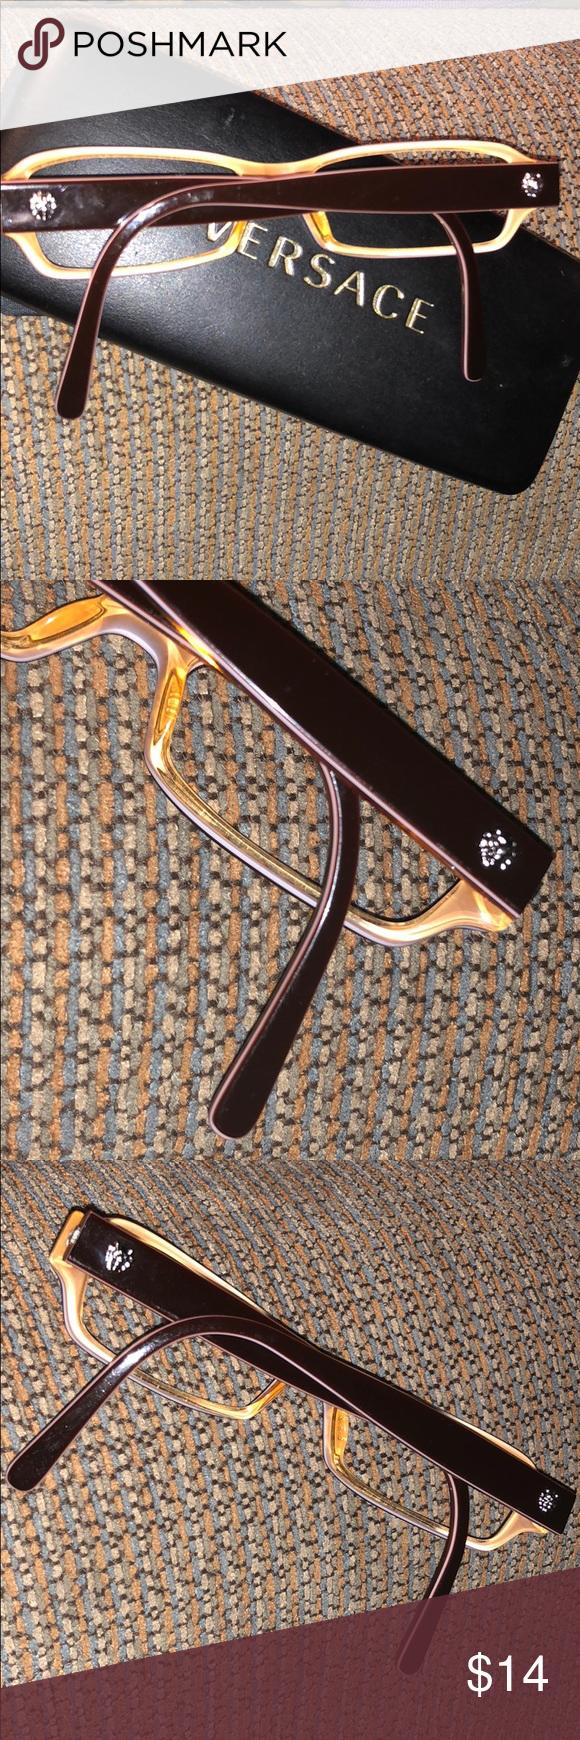 b2abe8e2b716 Versace Versus brown orange frame mod8038 Great condition plastic frames no  lenses. Mod8038 Versace brown with burnt orange. Versus Versace Accessories  ...